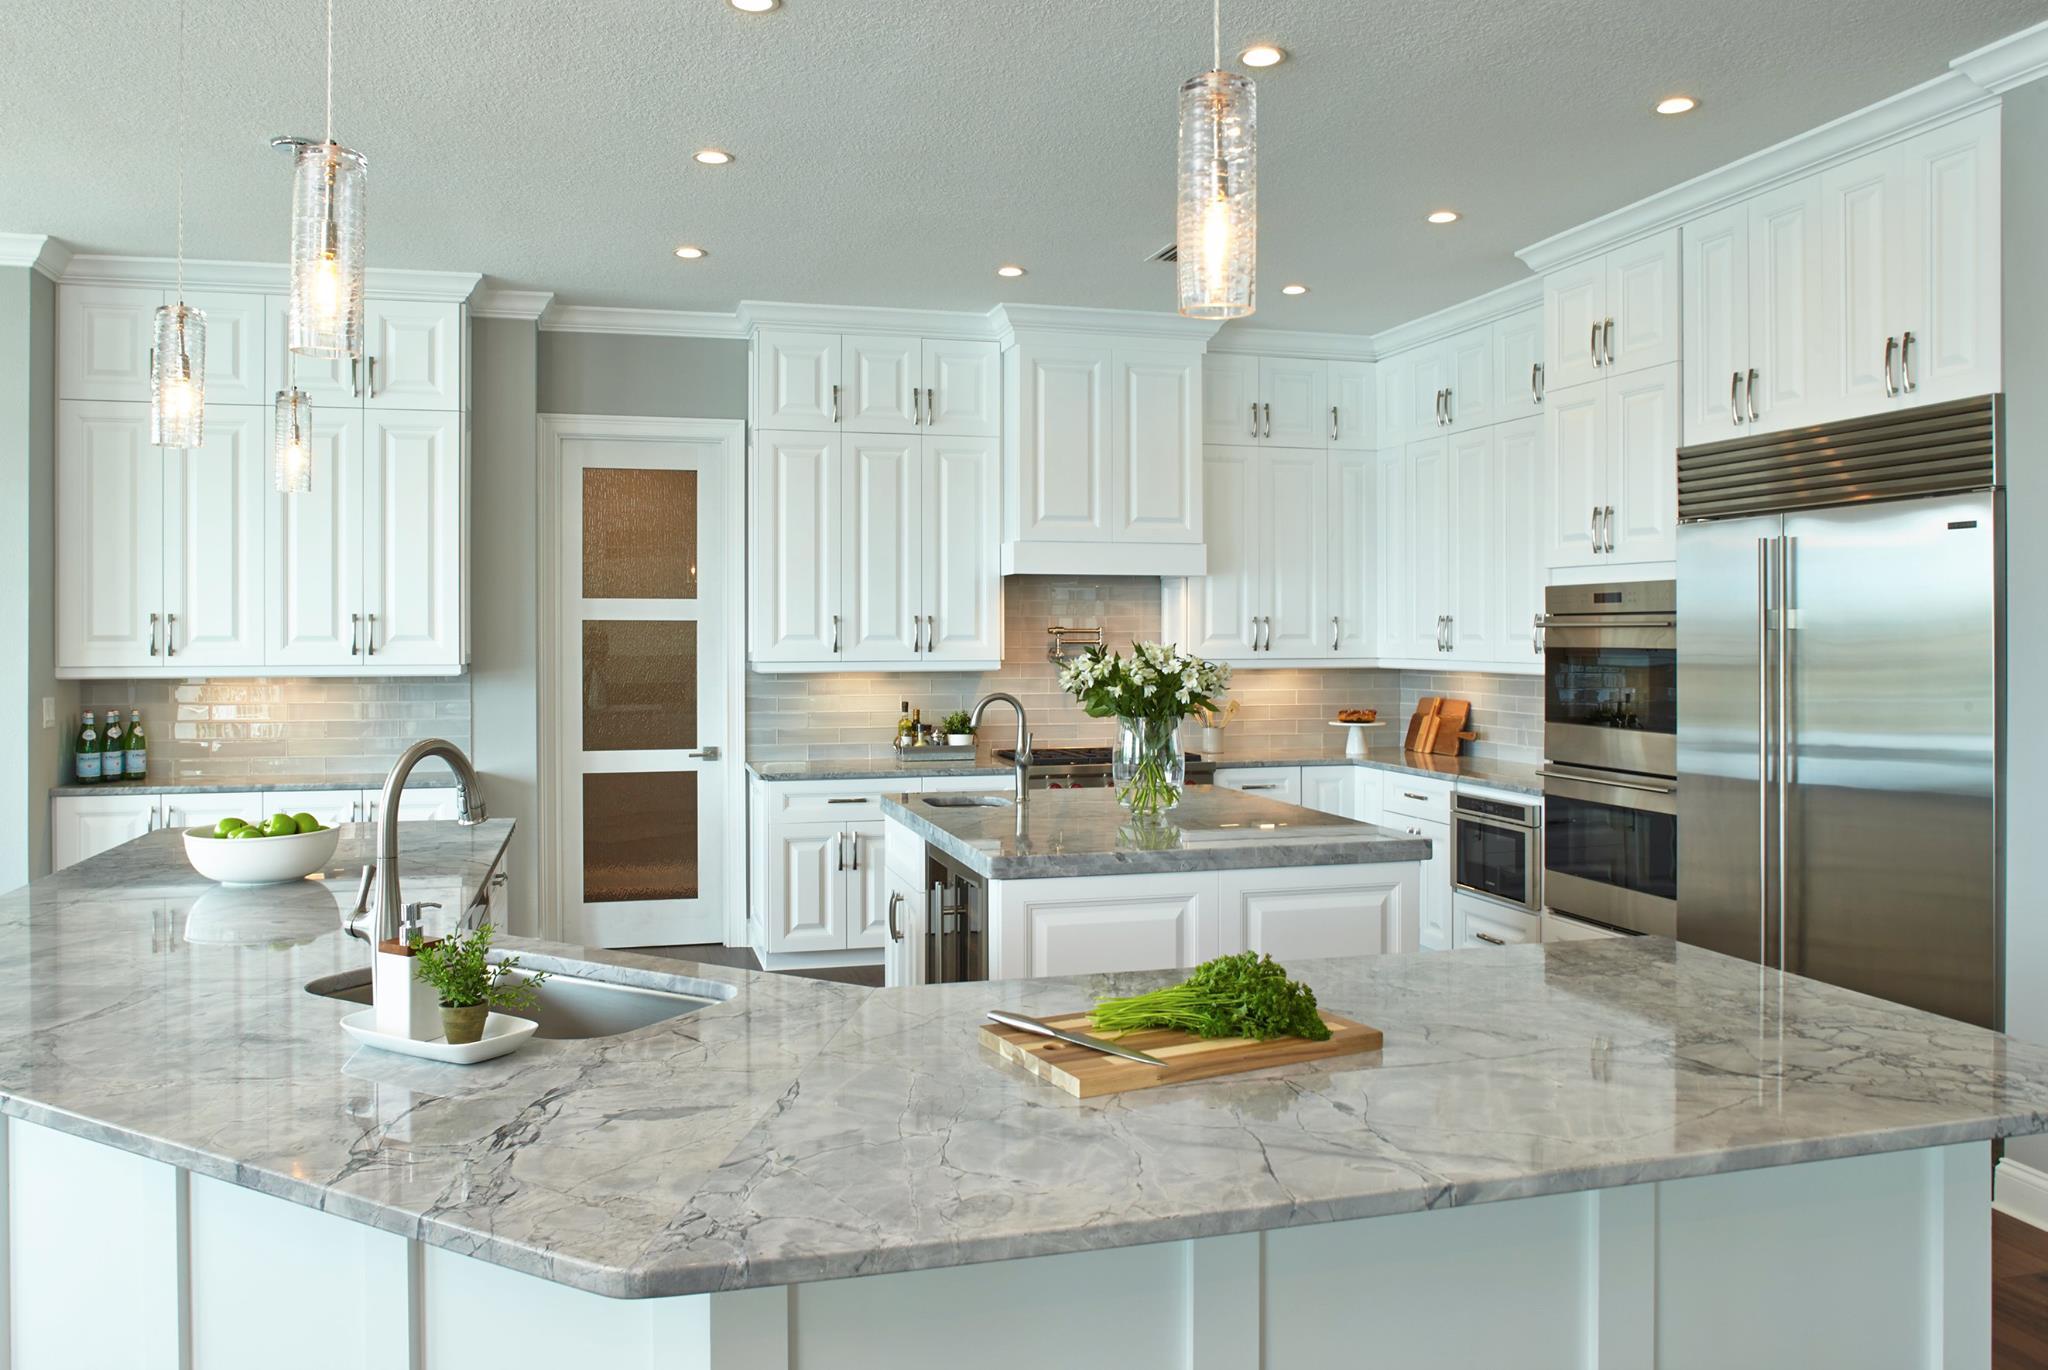 Kitchen Cabinets & More in San Antonio | New Generation ...